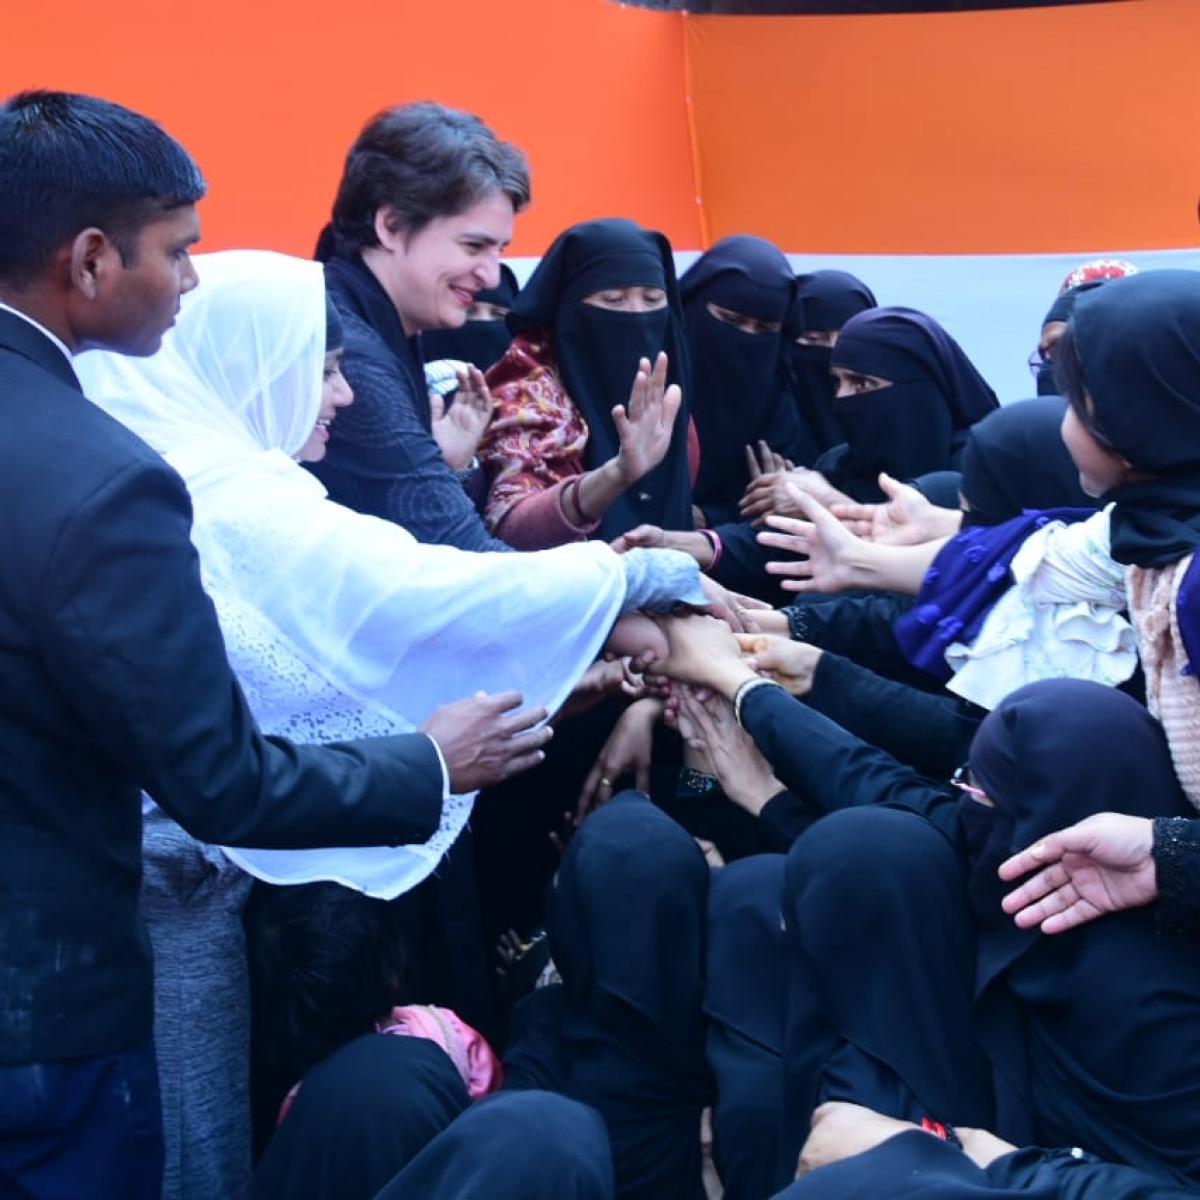 Priyanka Gandhi Meets Injured Protesters in Akhilesh' constituency